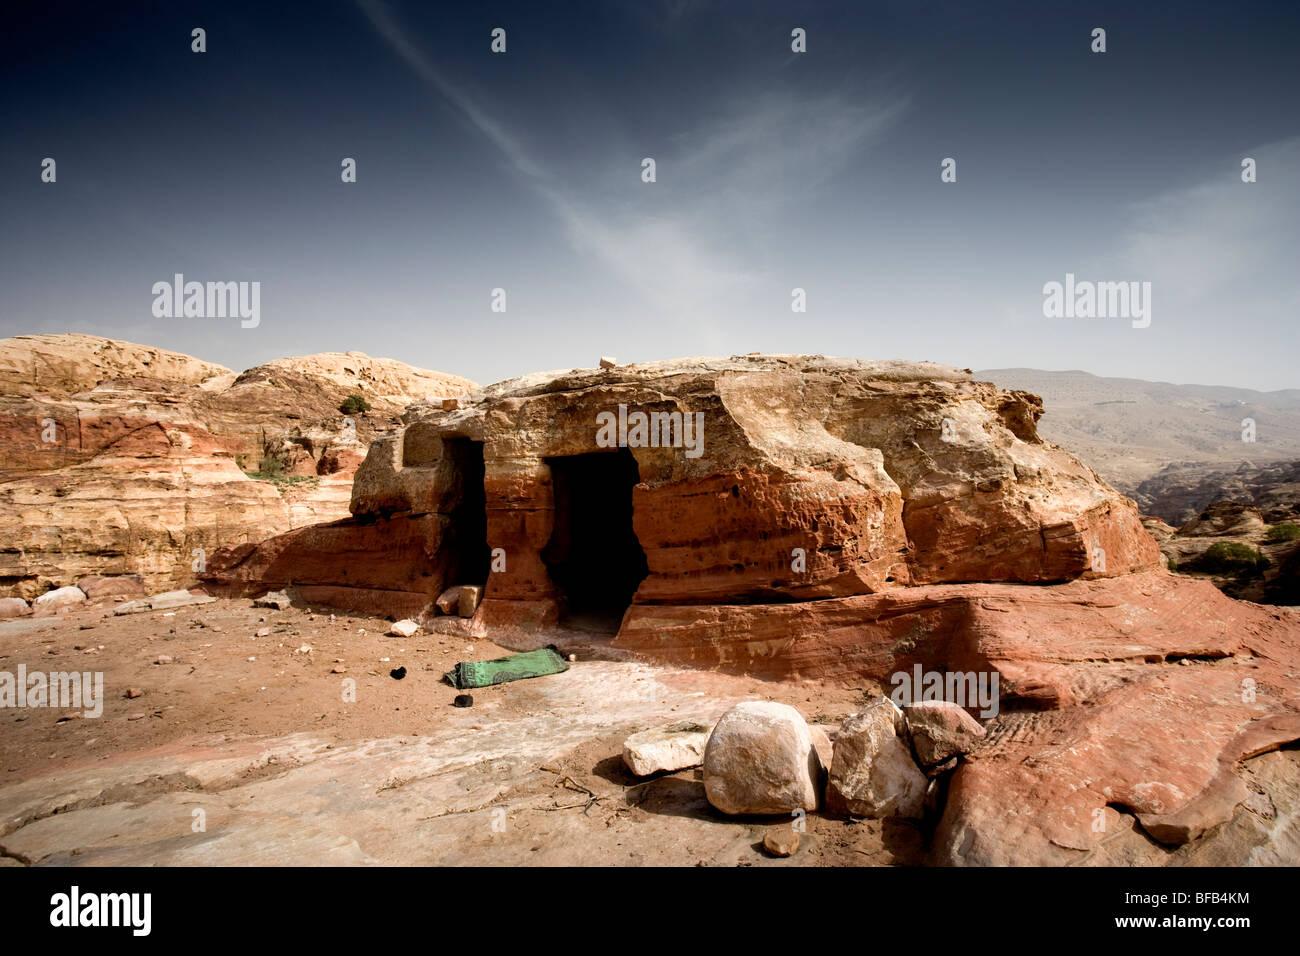 Cave dwelling on Jabal Al-Khubtha, Petra, Jordan - Stock Image